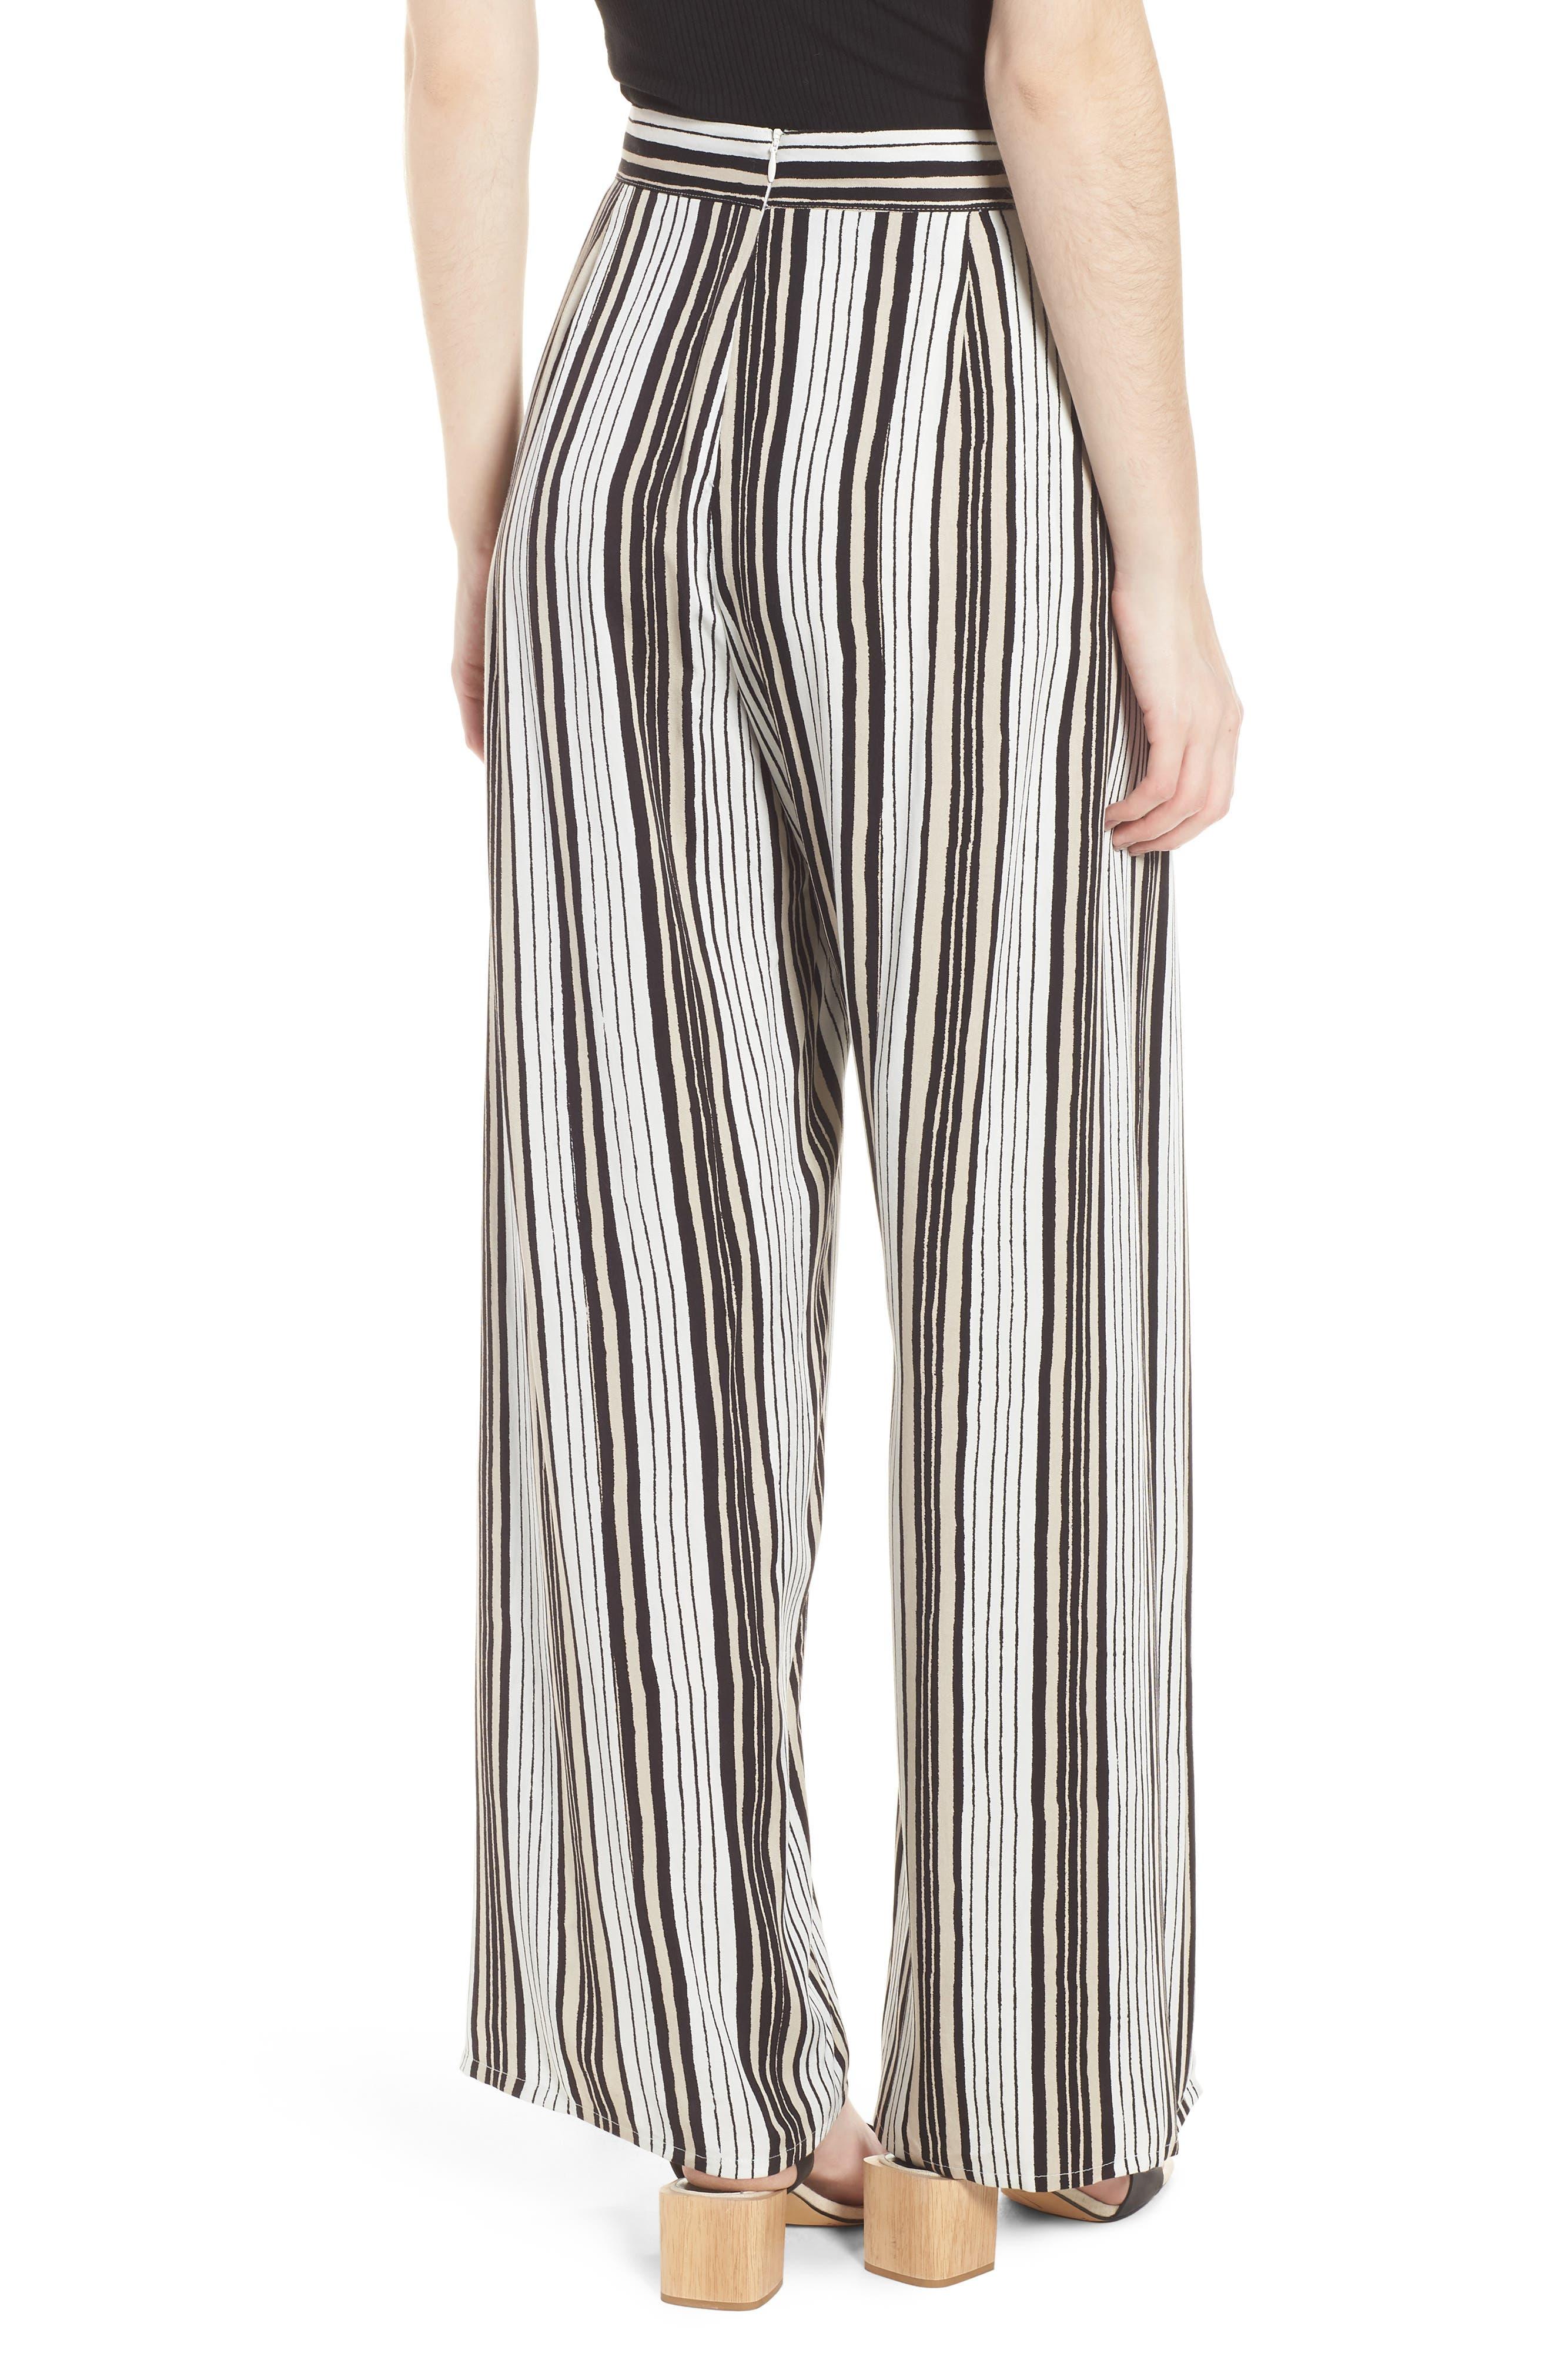 Avah Stripe Pants,                             Alternate thumbnail 2, color,                             Ivory